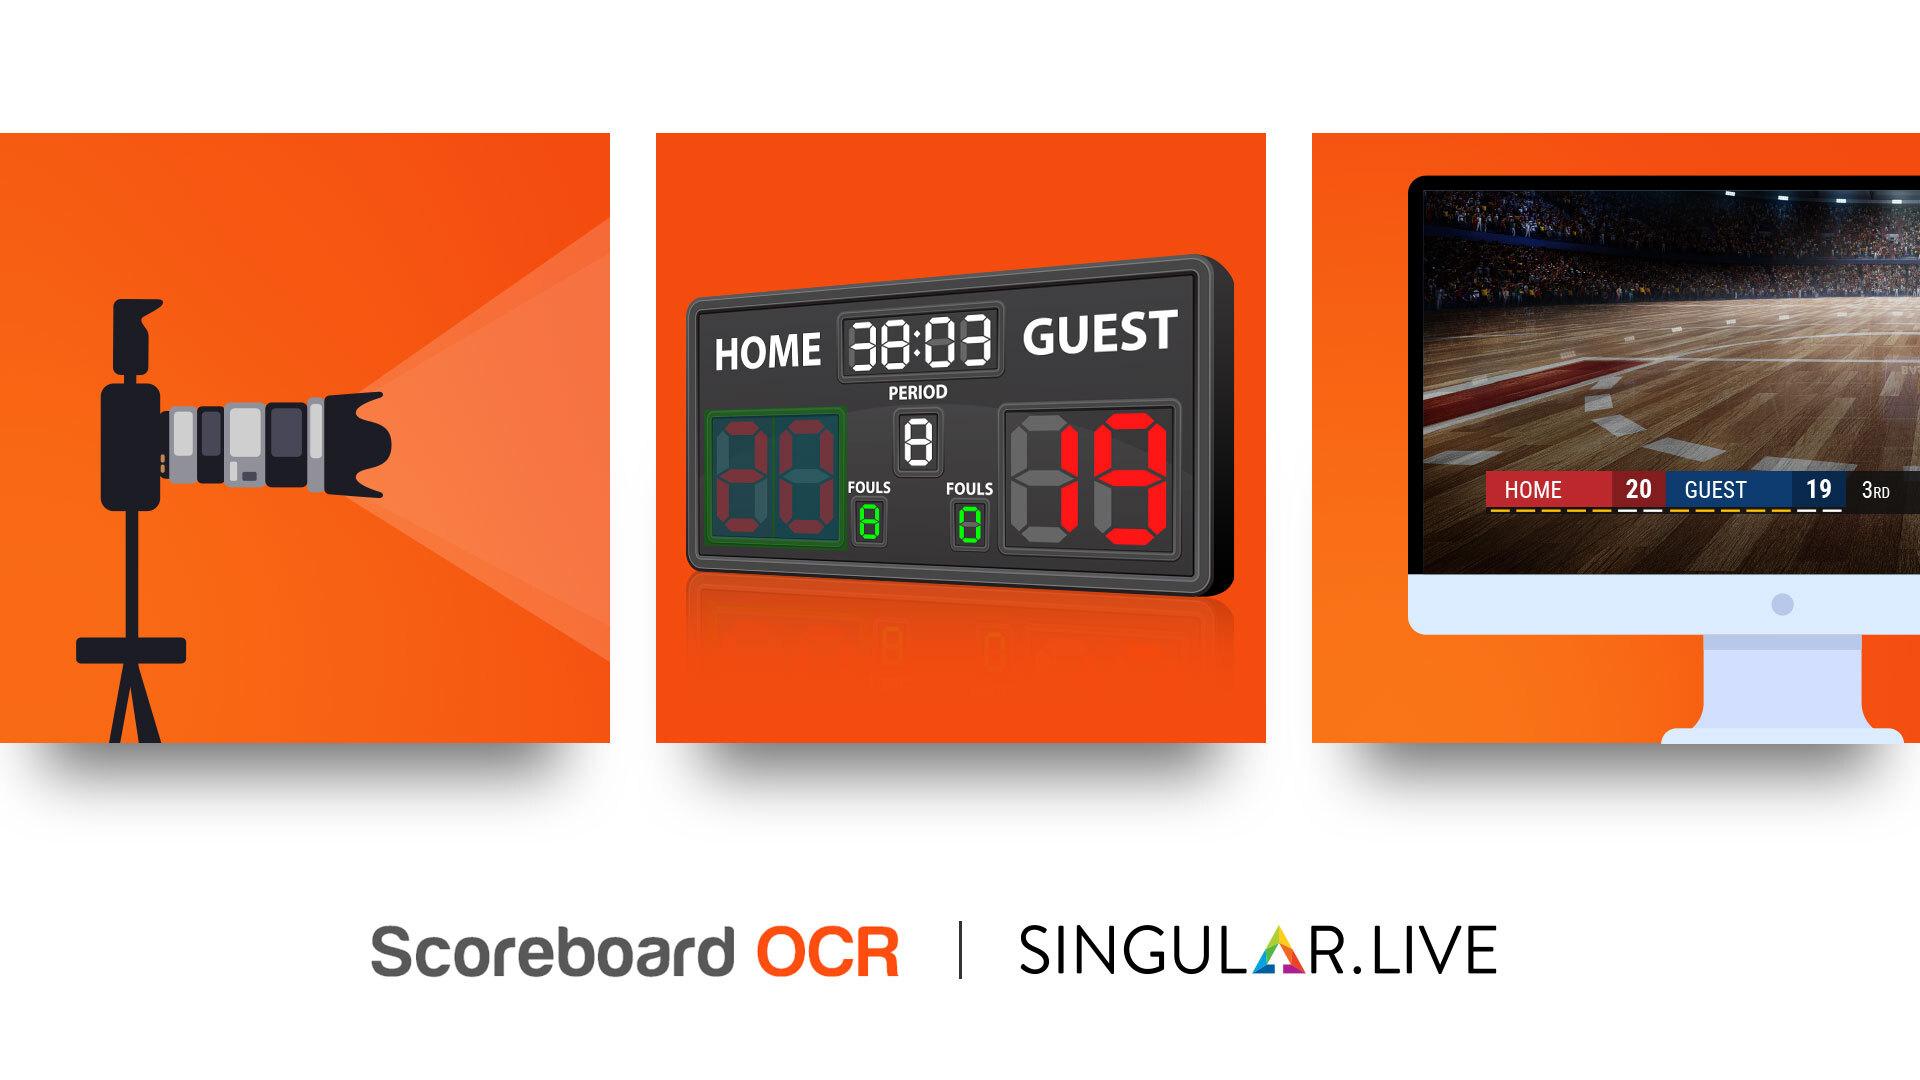 Scoreboard OCR - Send Scoreboard Digits to Overlays With a Camera